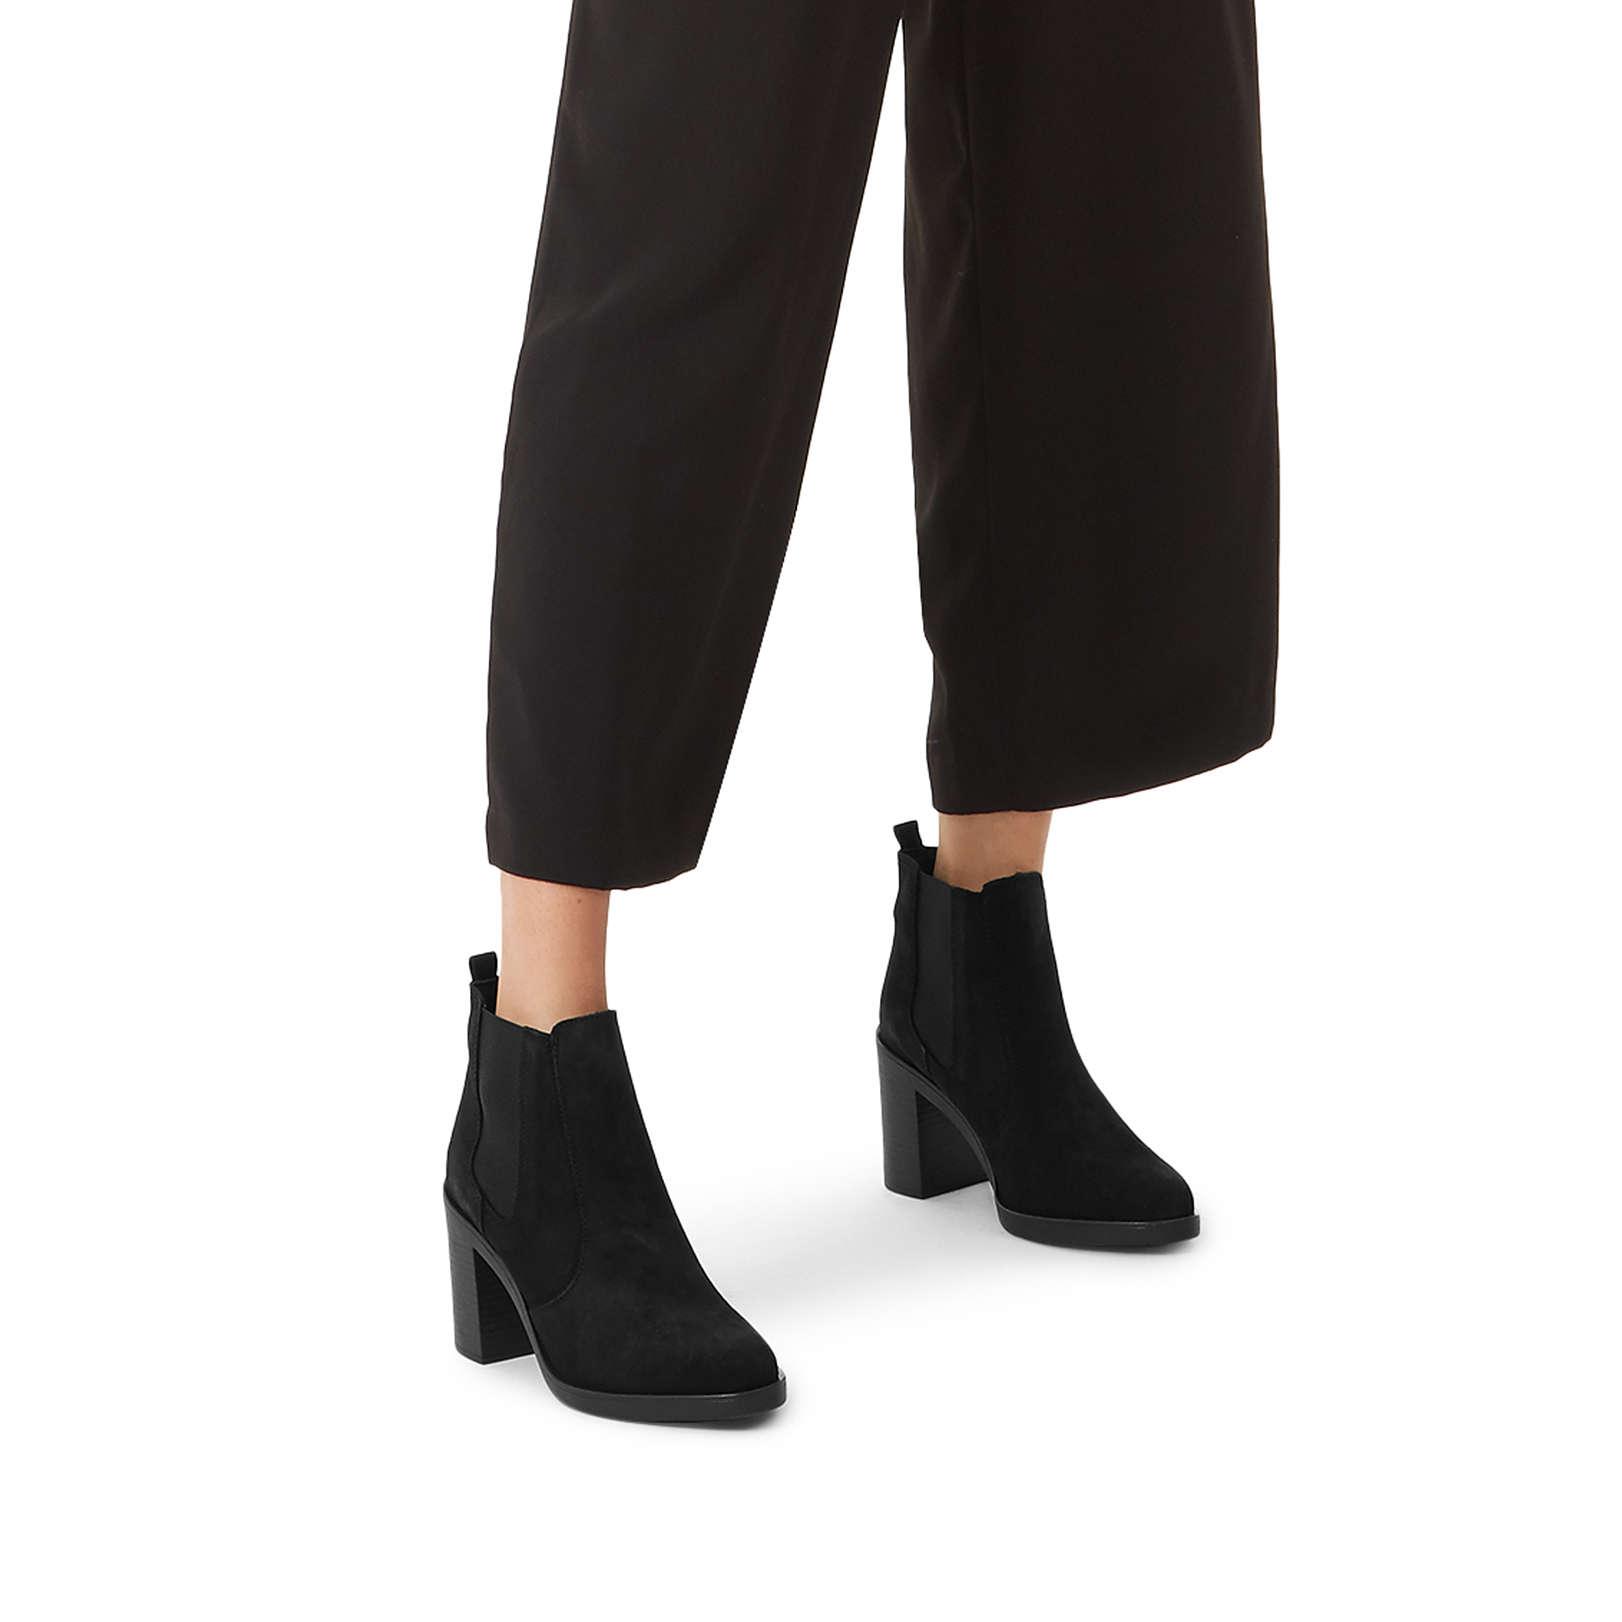 SICILY - KURT GEIGER LONDON Ankle Boots